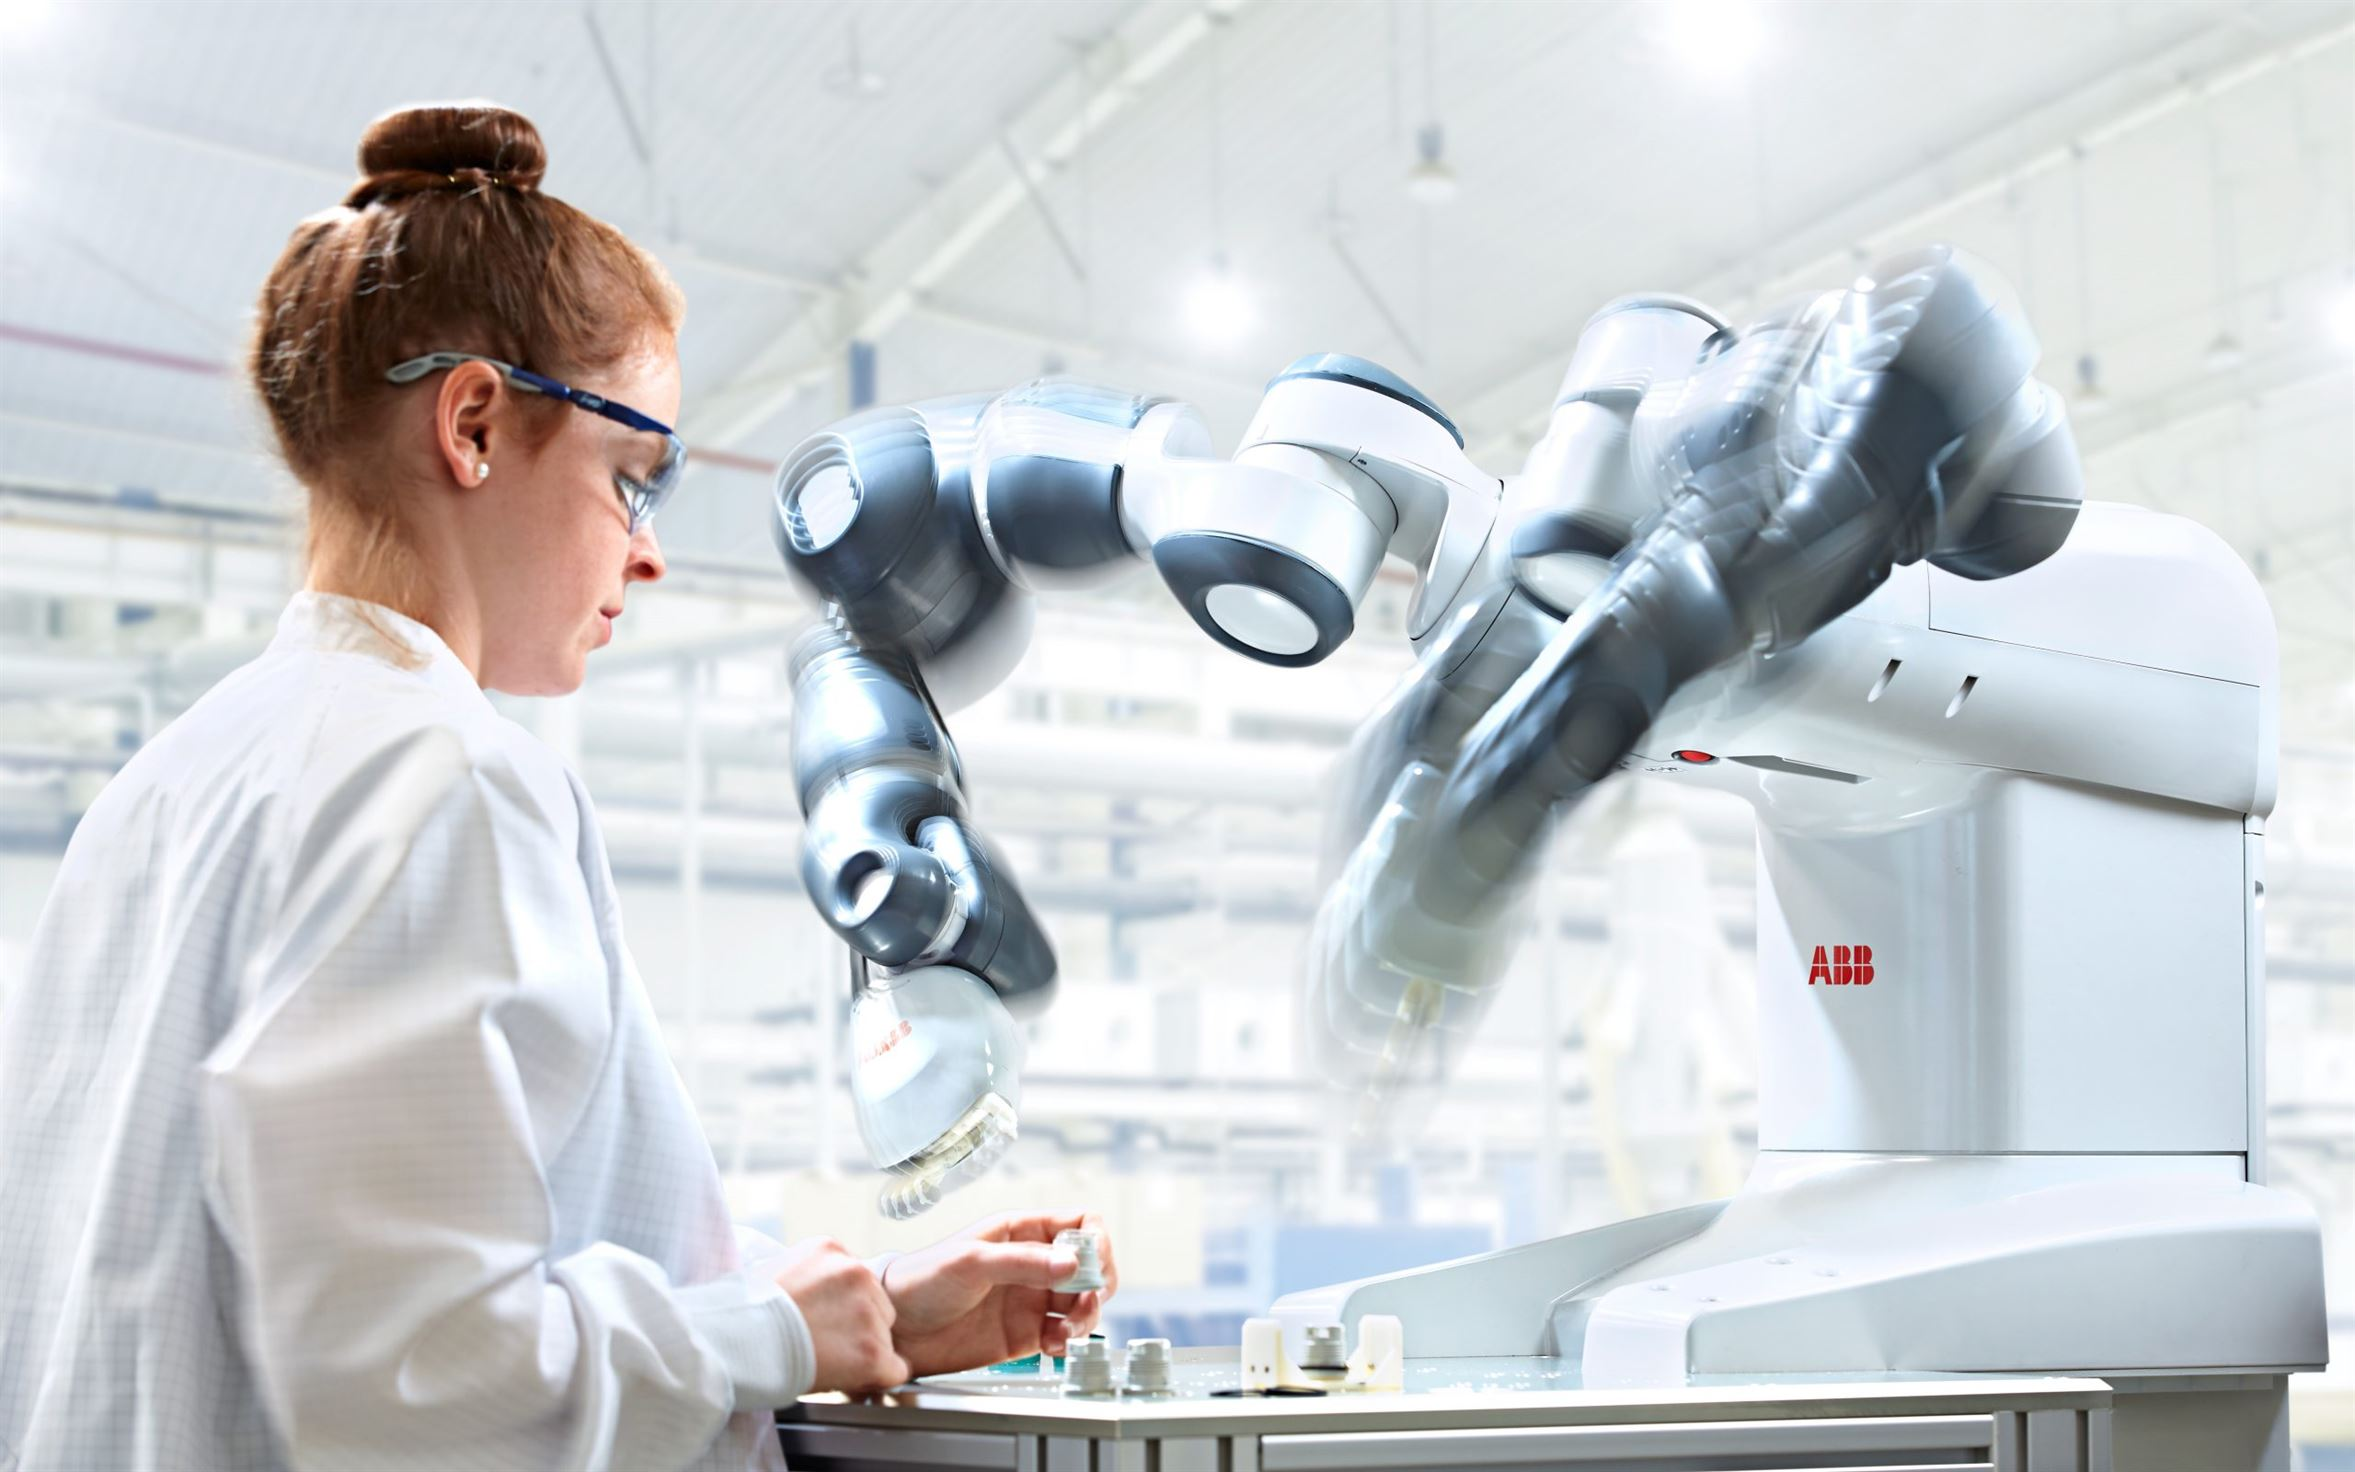 Cobot: i Robot Collaborativi portati dall'industria 4.0